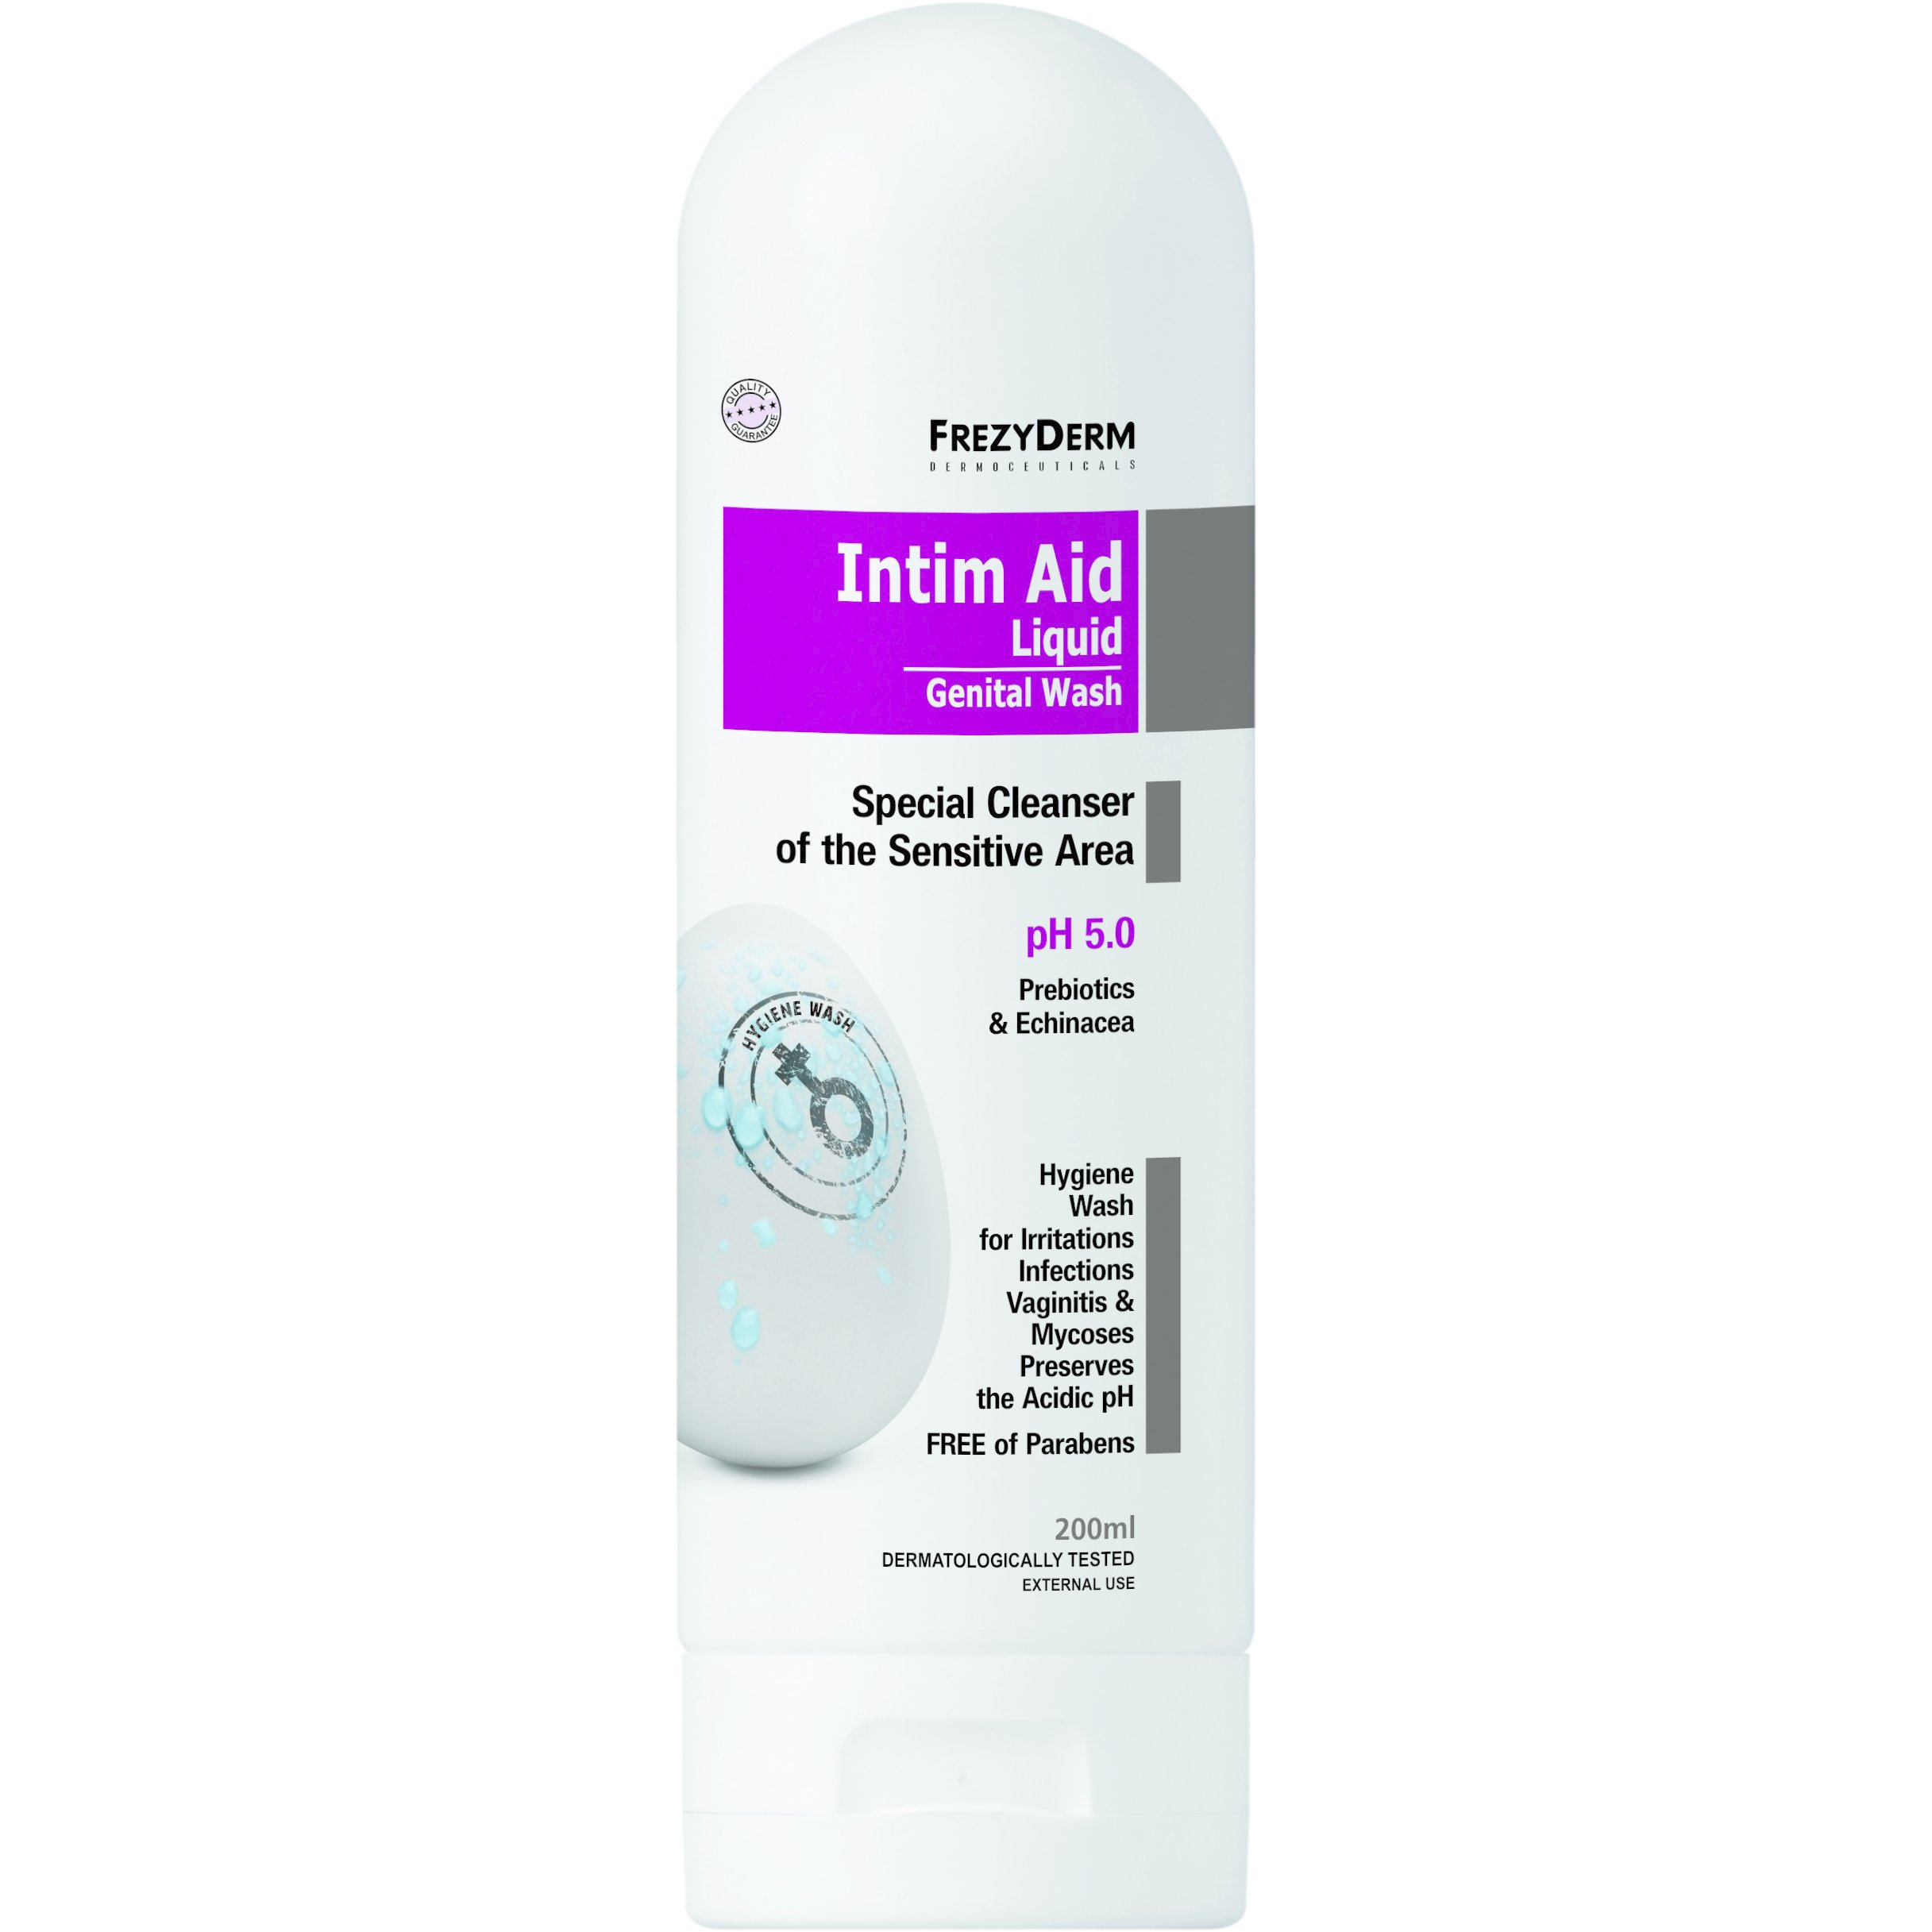 Frezyderm Intim Aid p.H5.0 Εξειδικευμένο Καθαριστικό της Ευαίσθητης Περιοχής 200ml